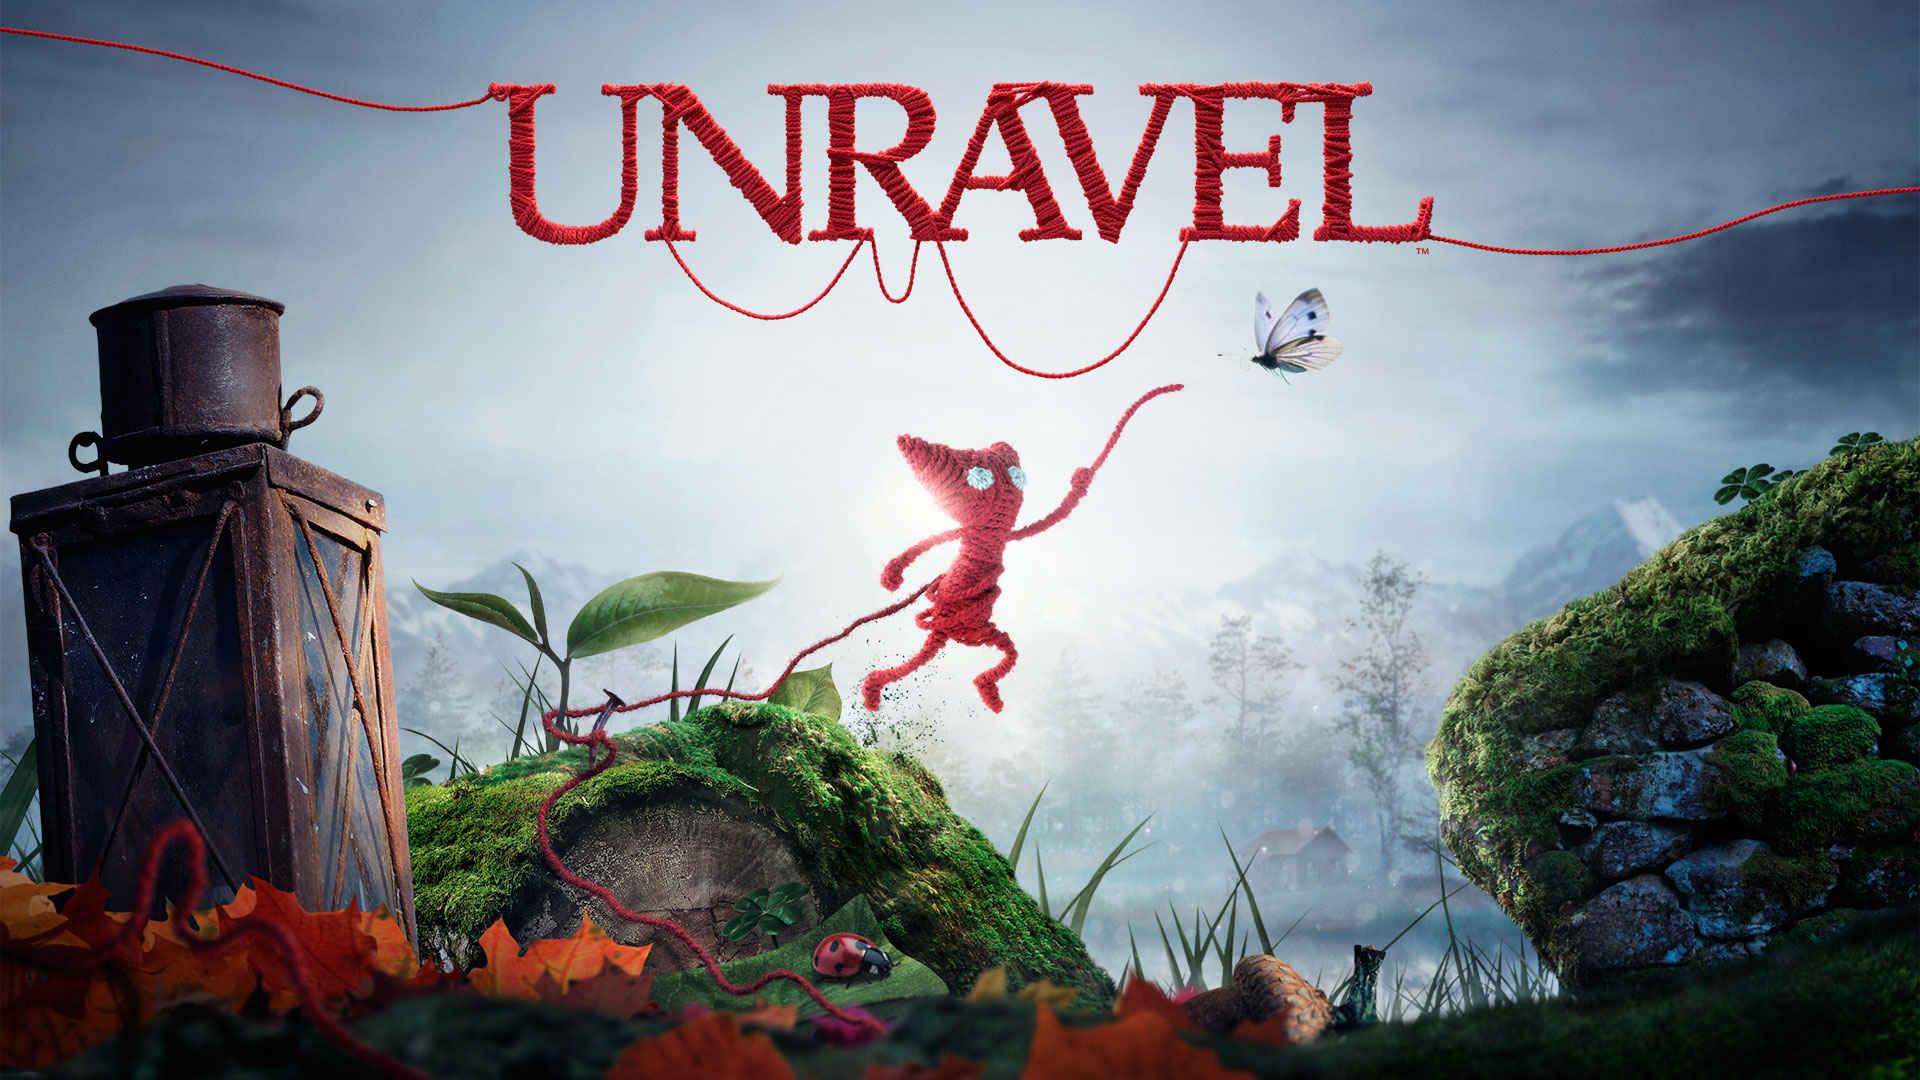 3D Unravel Game Wallpaper